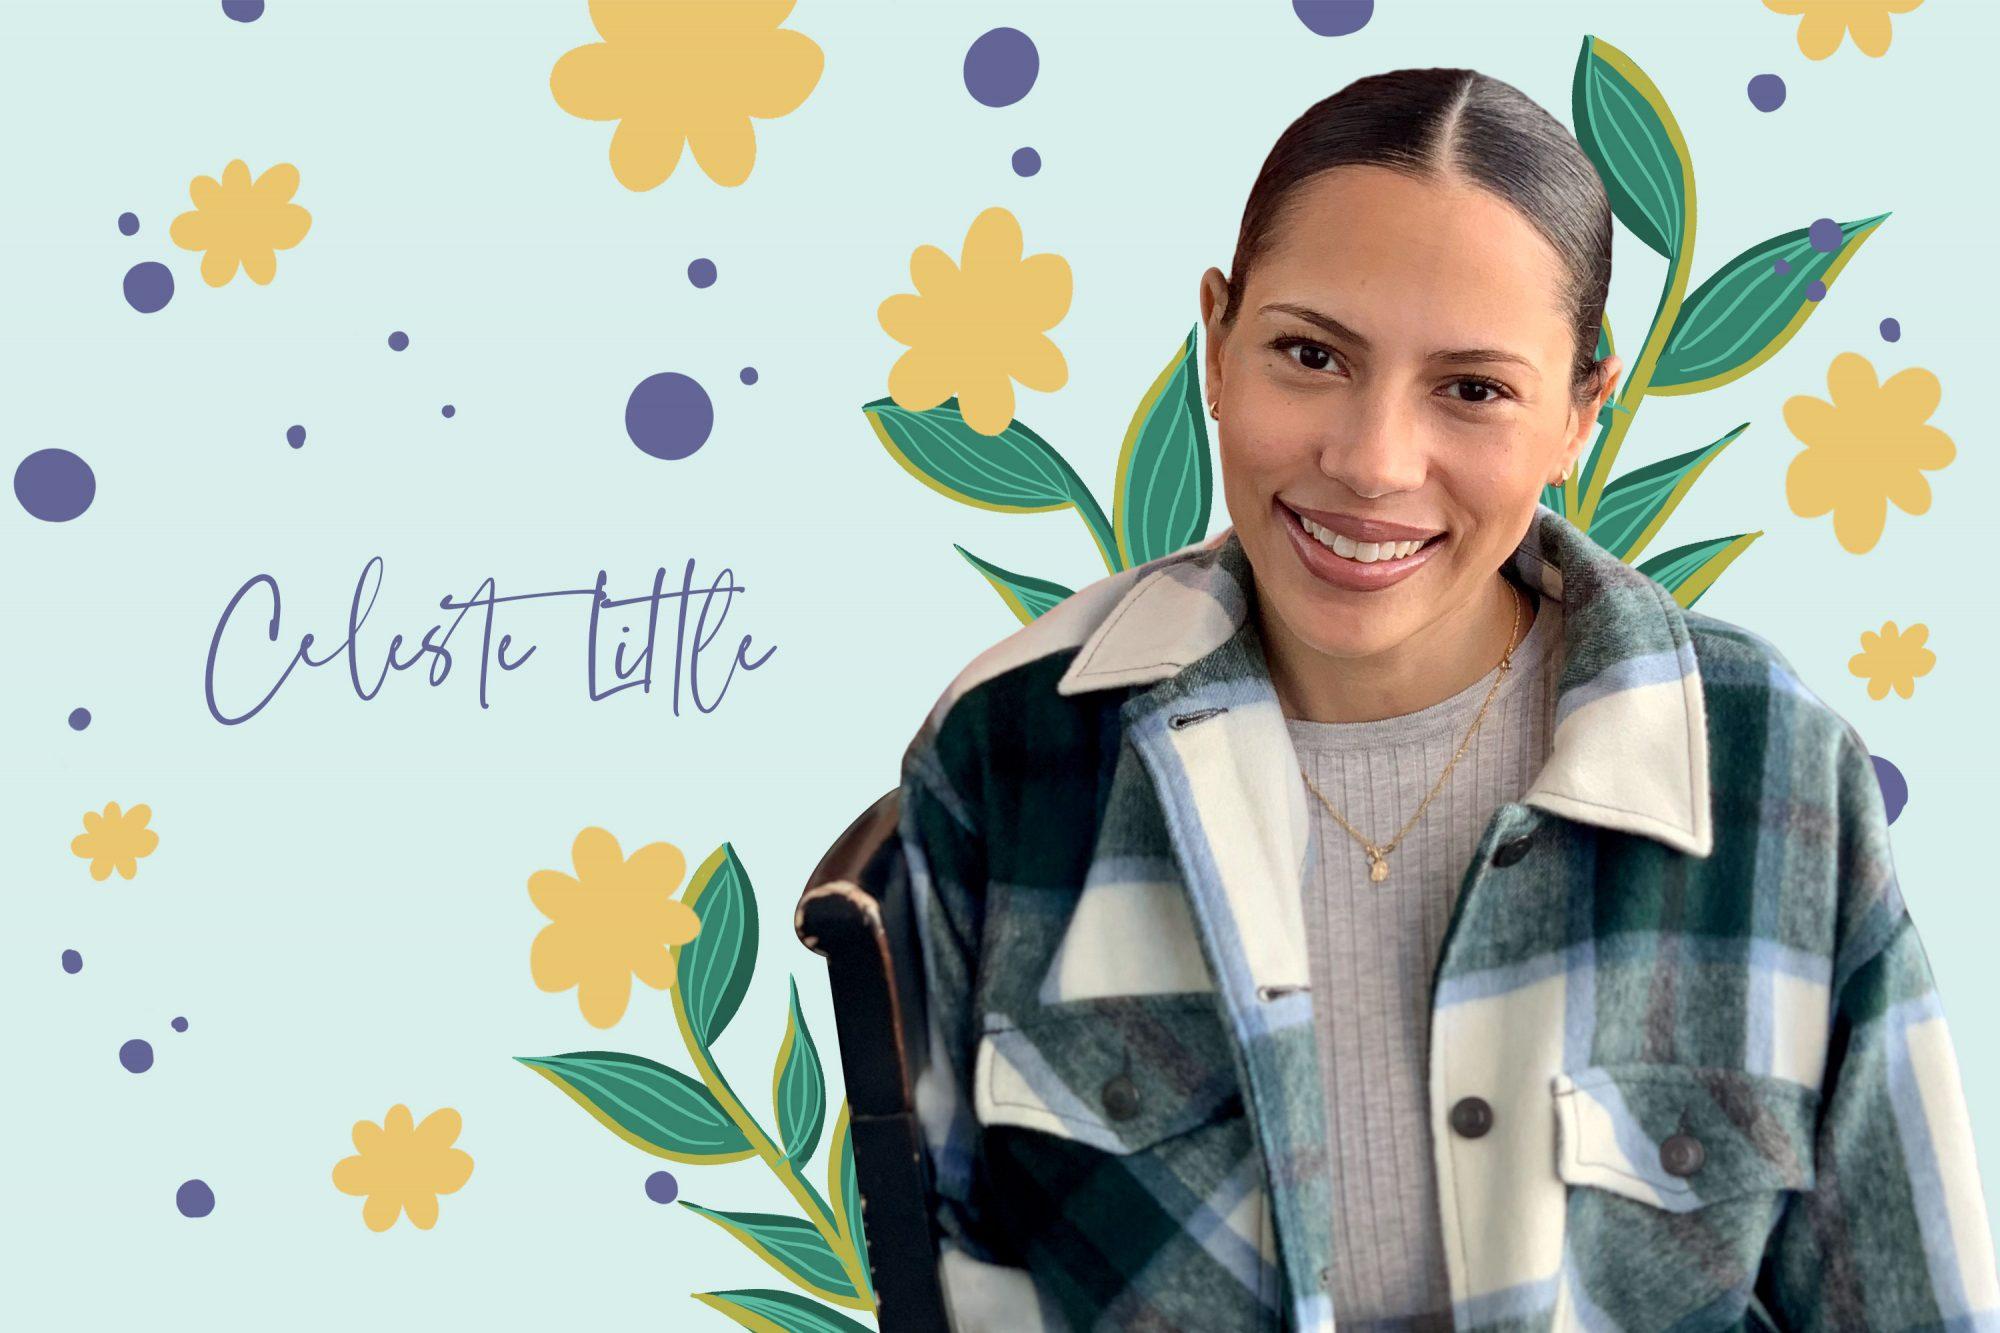 Celeste_Little